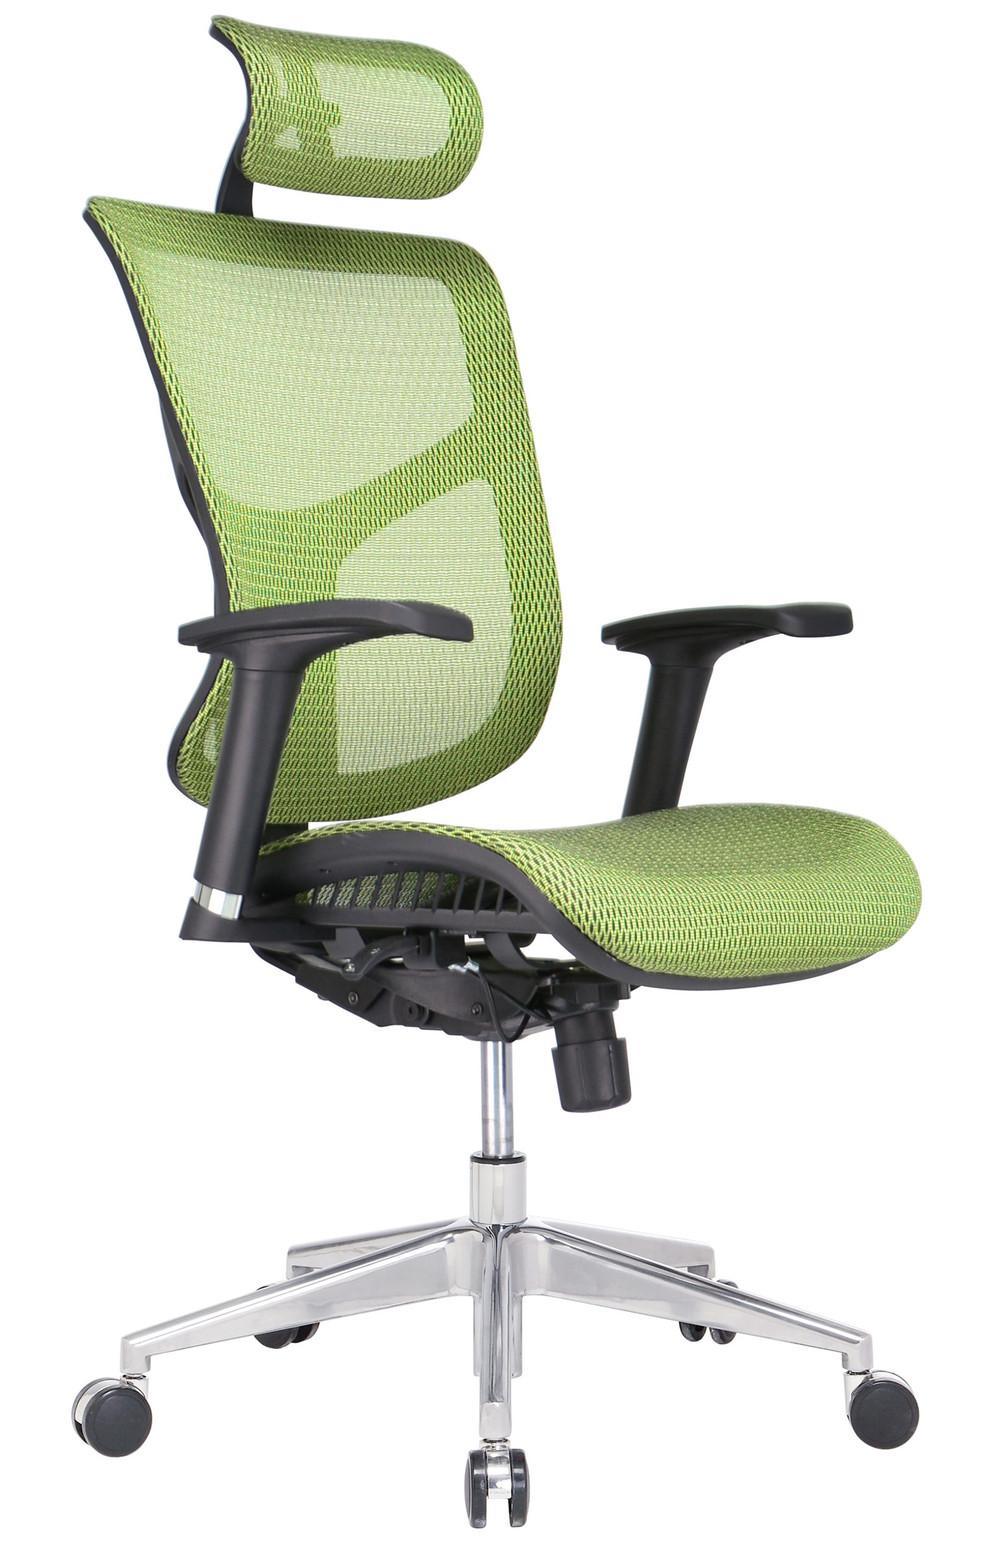 Oficina china precio silla silla de oficina hecho en china for Sillas para oficina office max